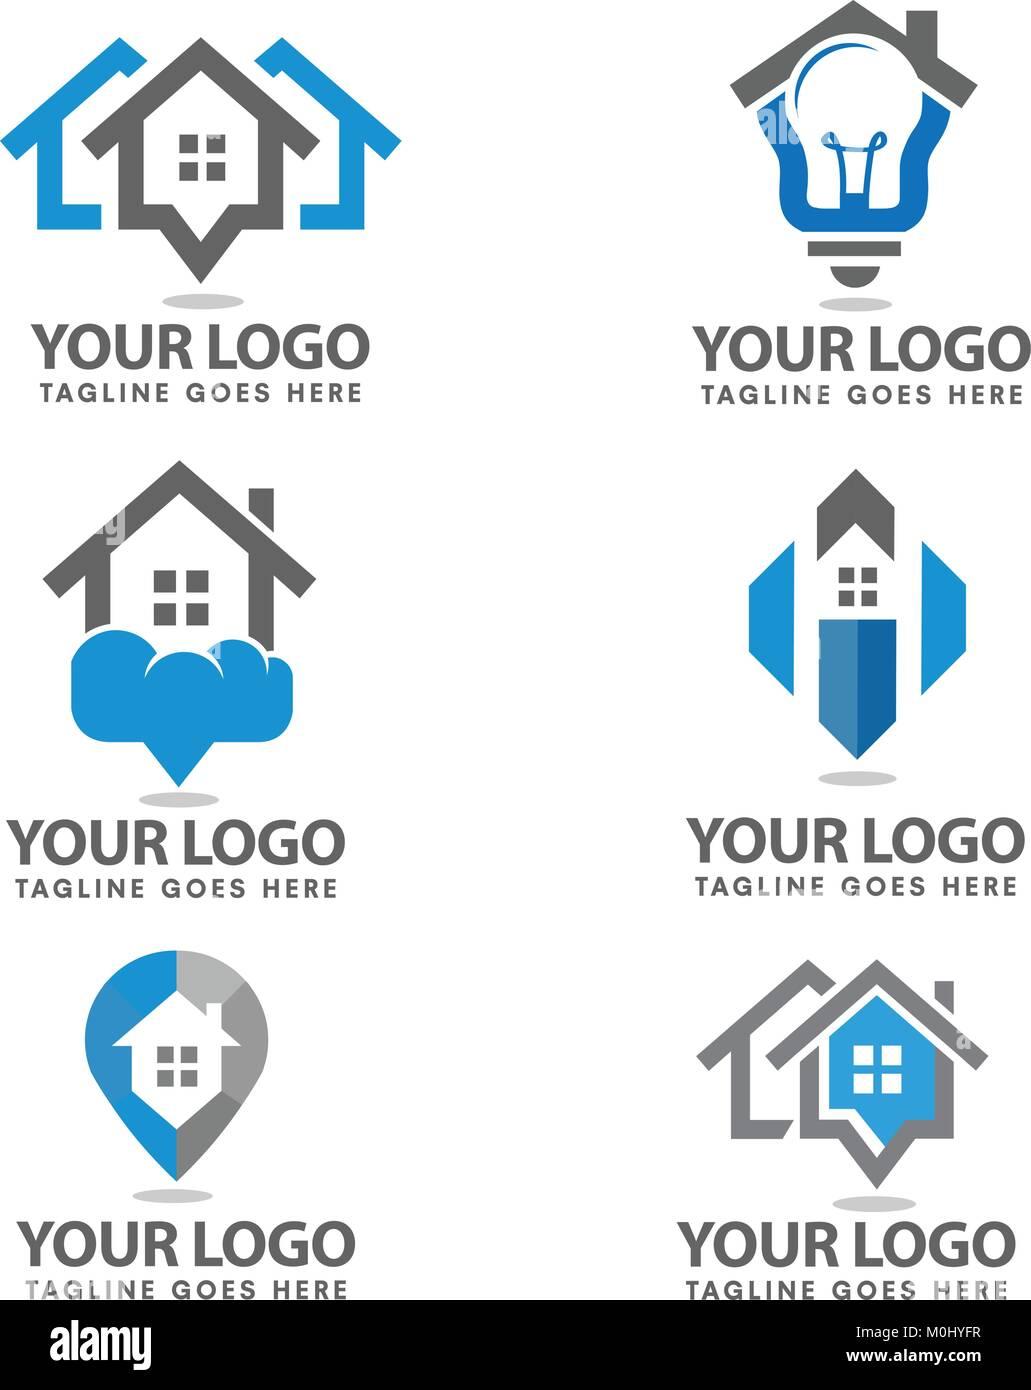 Simple Trend Real Estate Vector Logo Home Idea Simple House